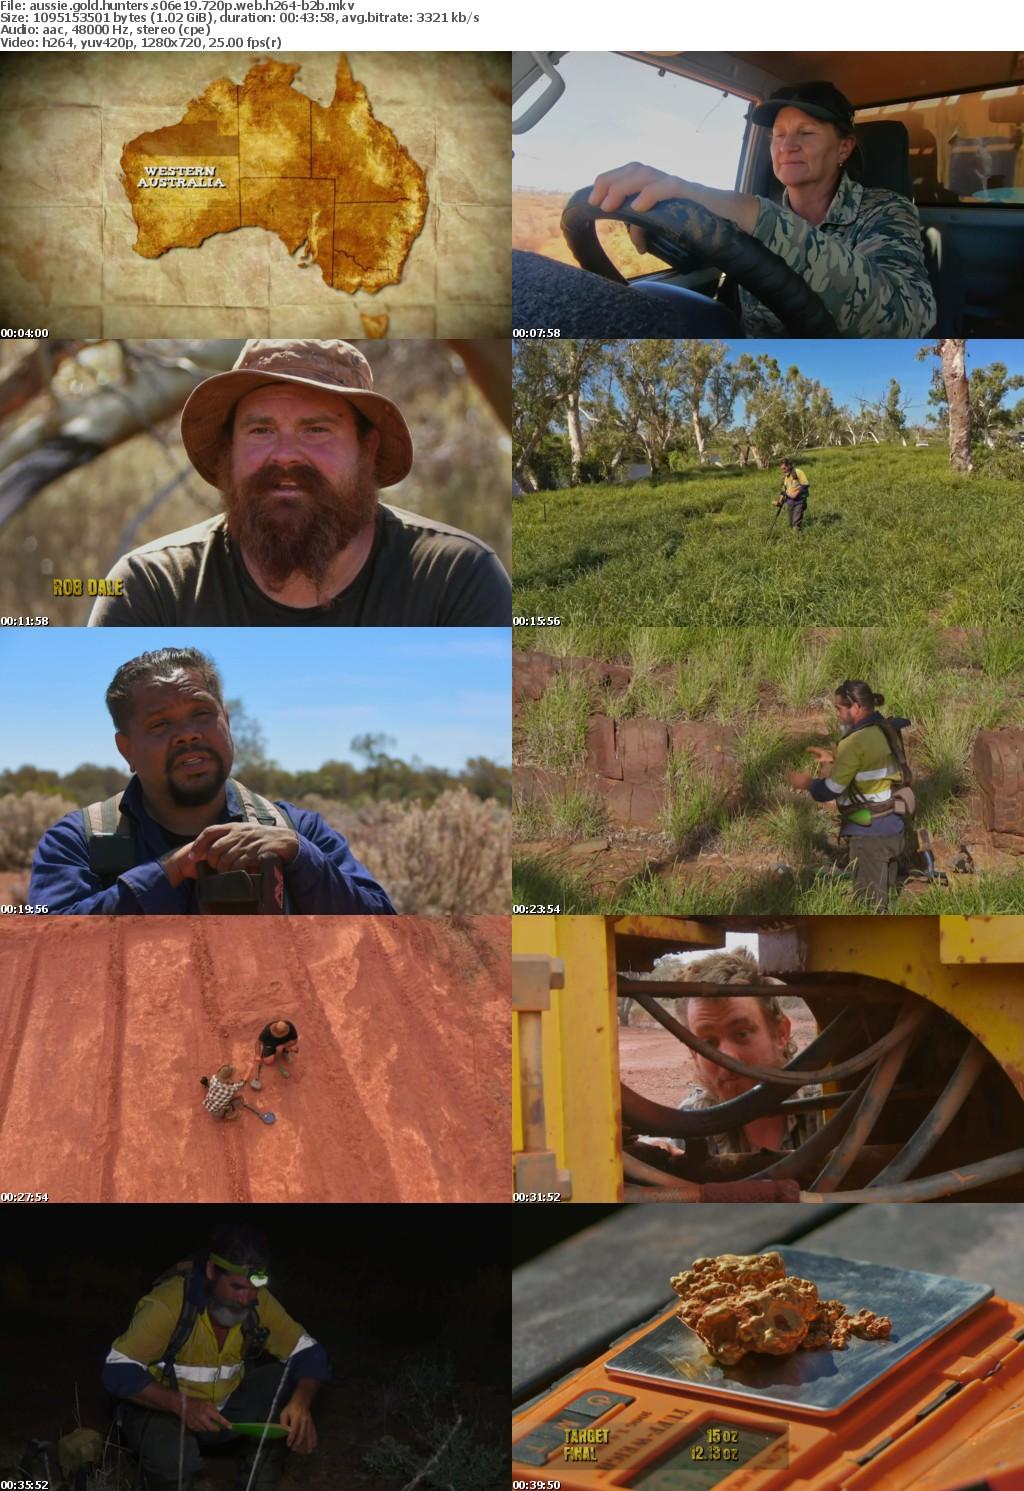 Aussie Gold Hunters S06E19 720p WEB h264-B2B